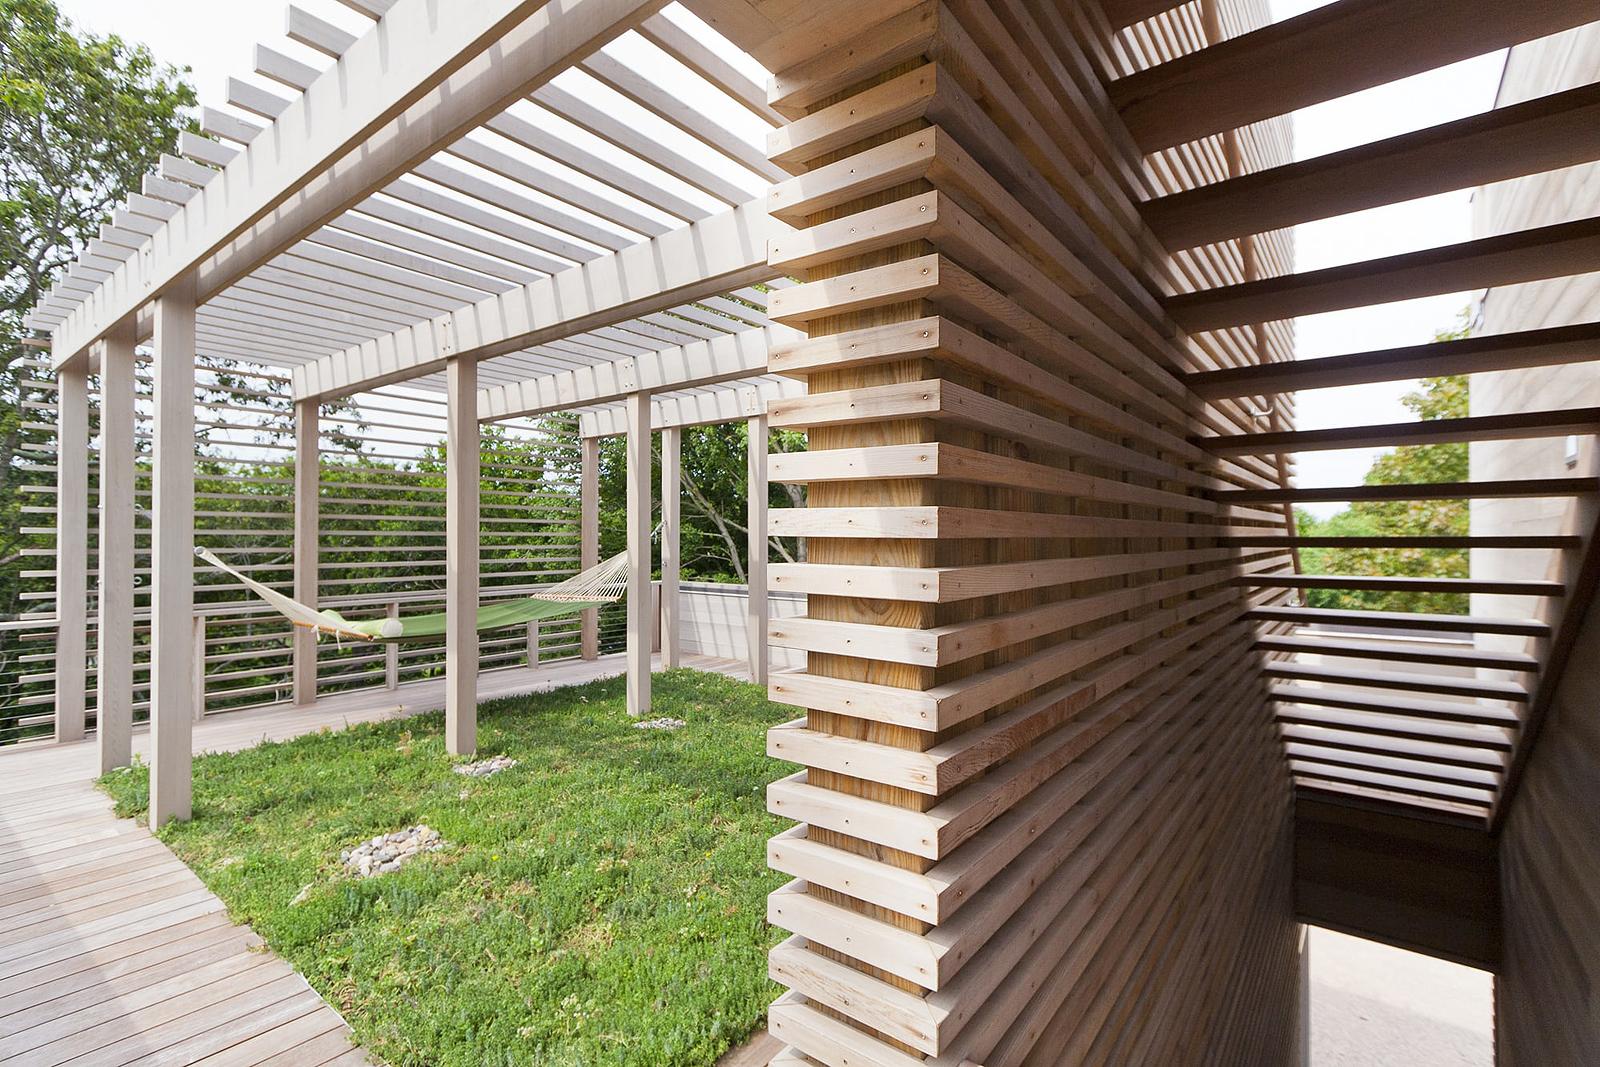 22-res4-resolution-4-architecture-modern-modular-home-prefab-house-fishers-island-exterior-roof-terrace-hammock.jpg